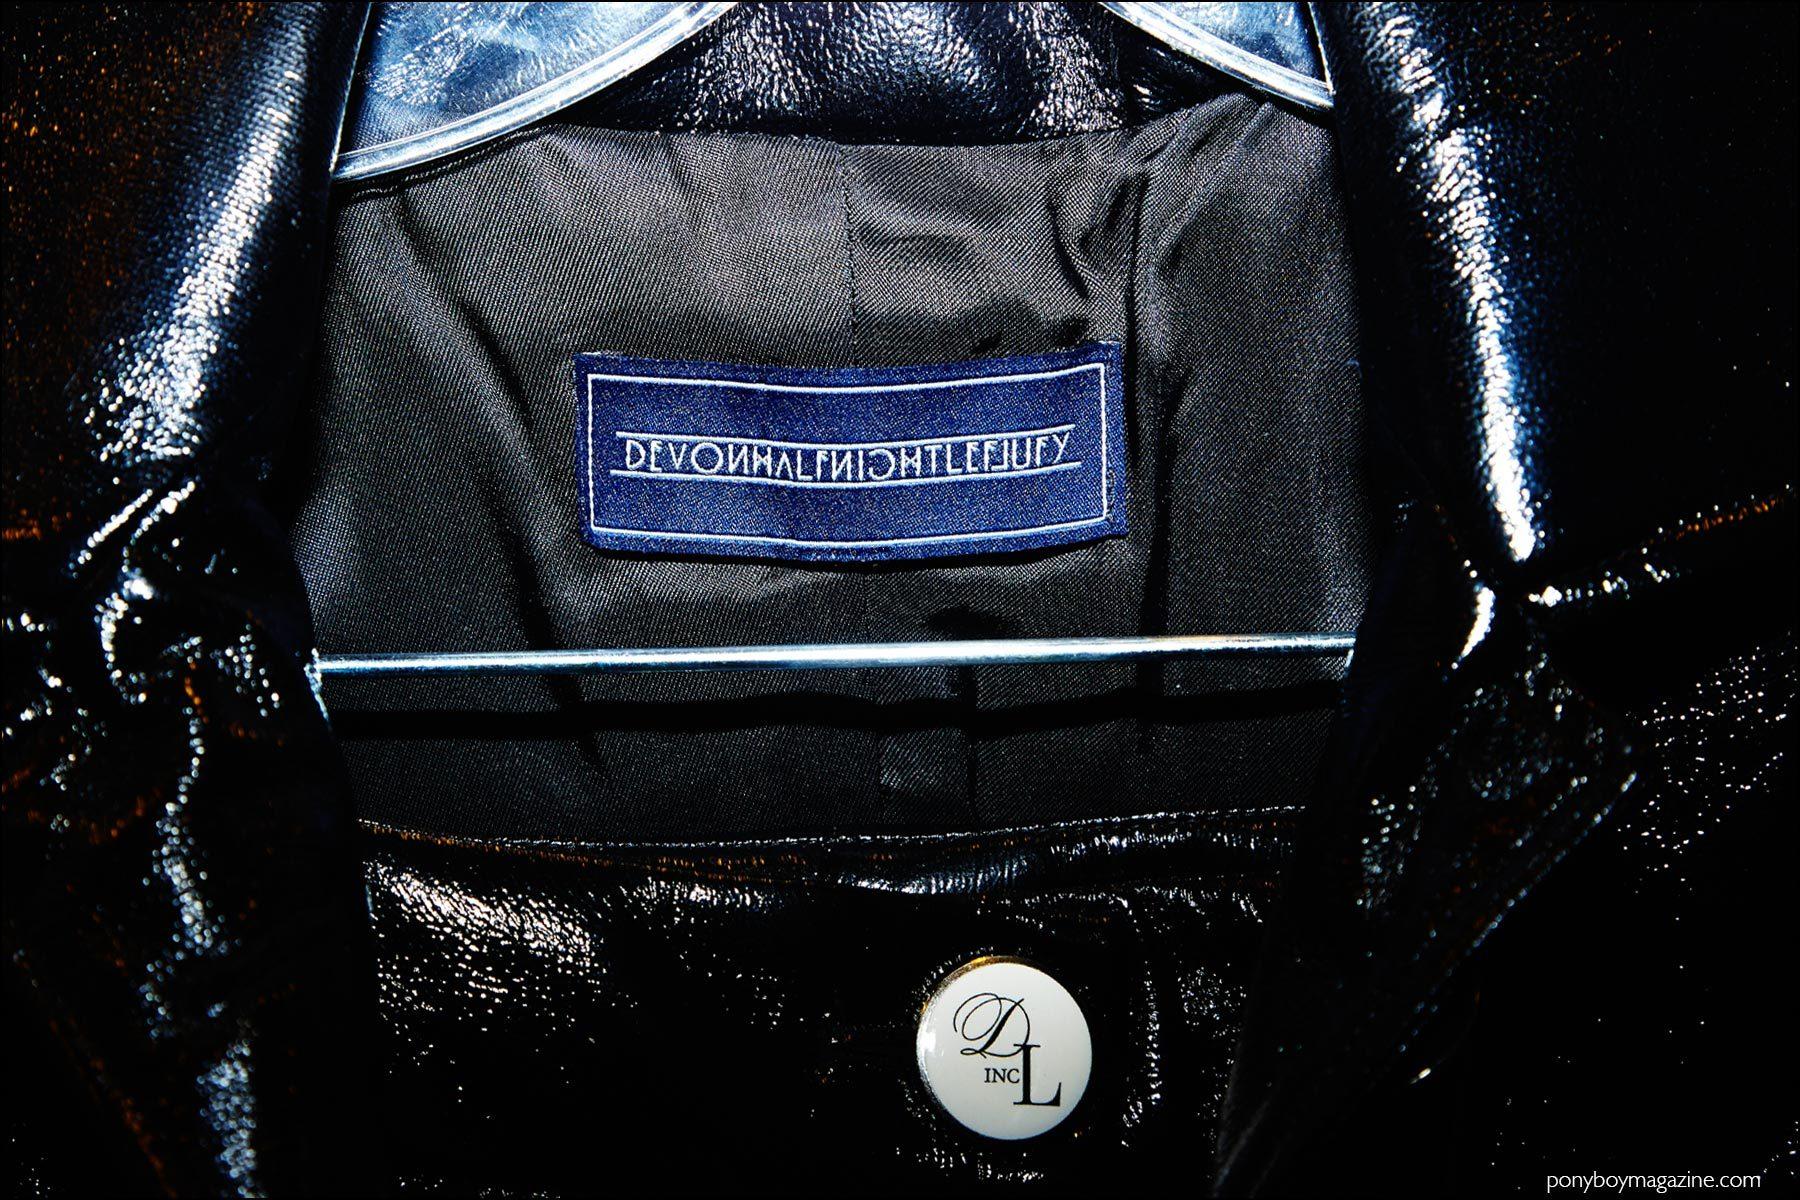 The label inside a vinyl coat photographed backstage at Devon Halfnight Leflufy S/S17 menswear show. Photography by Alexander Thompson for Ponyboy magazine NY.